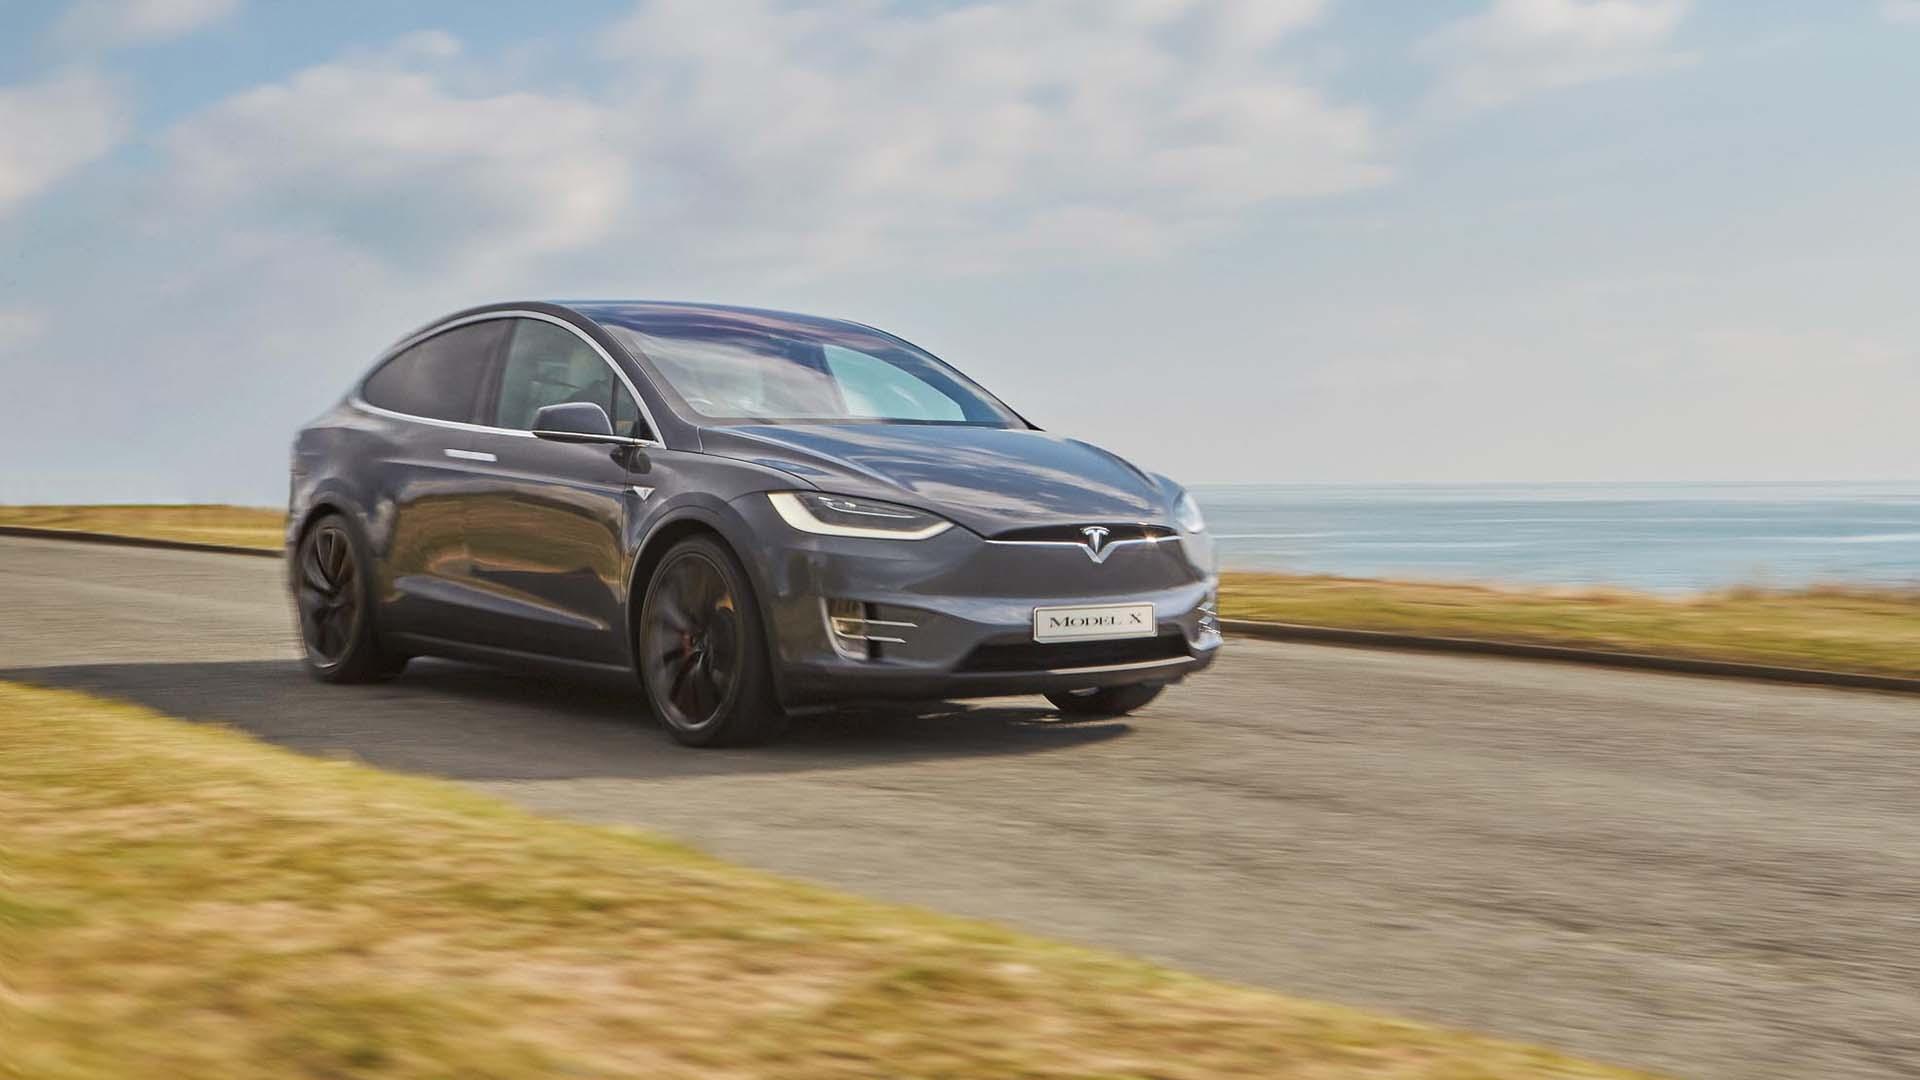 Tesla Model X – 314 miles